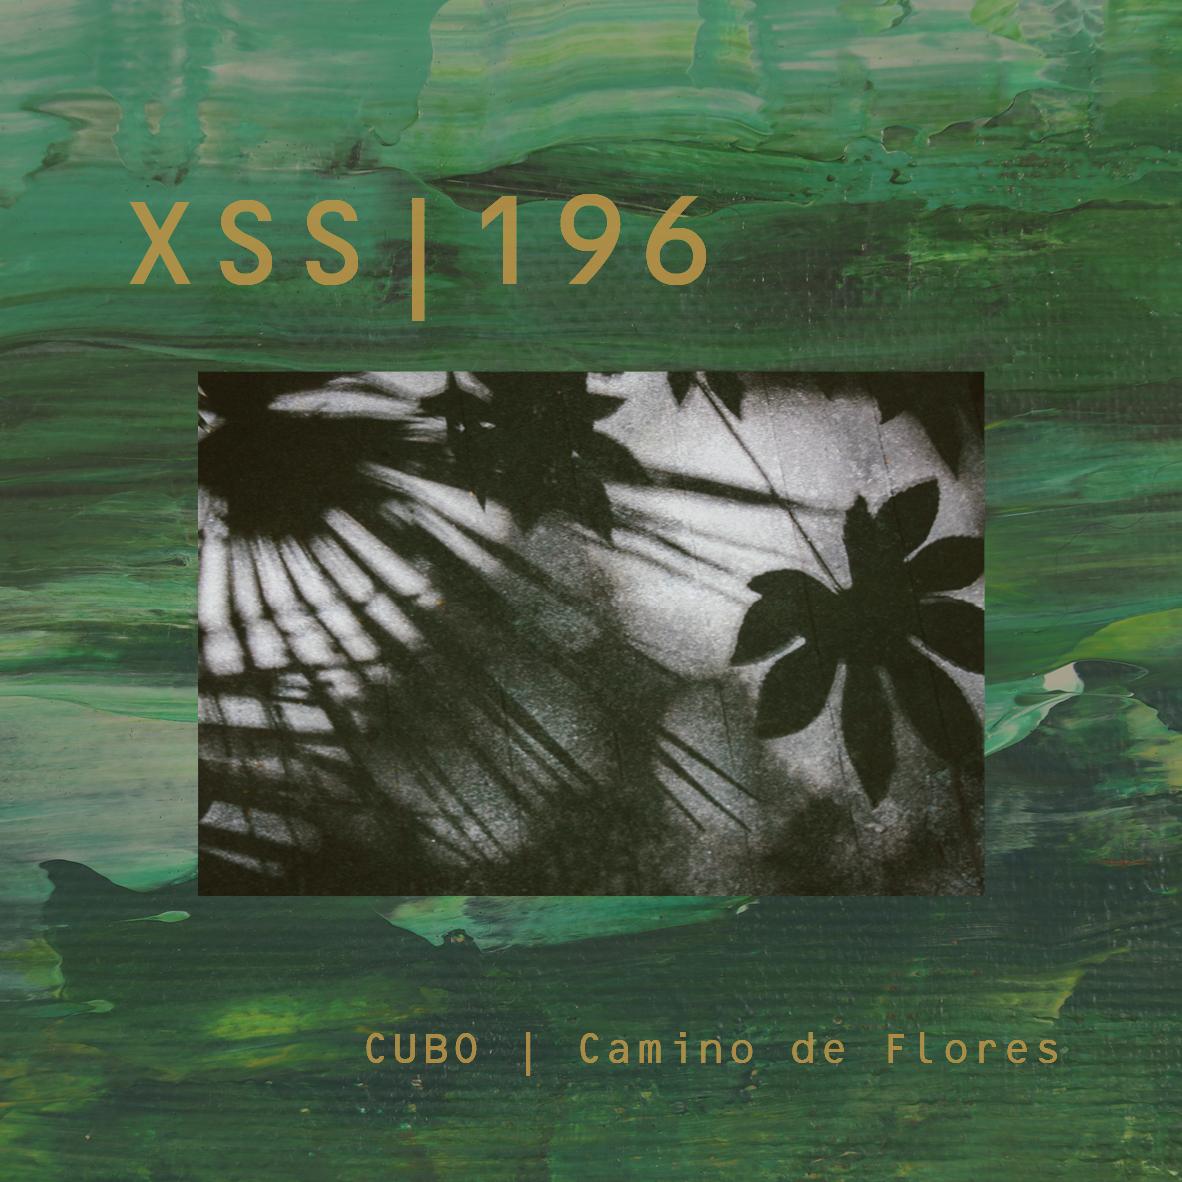 XSS196 | Cubo | Camino de Flores